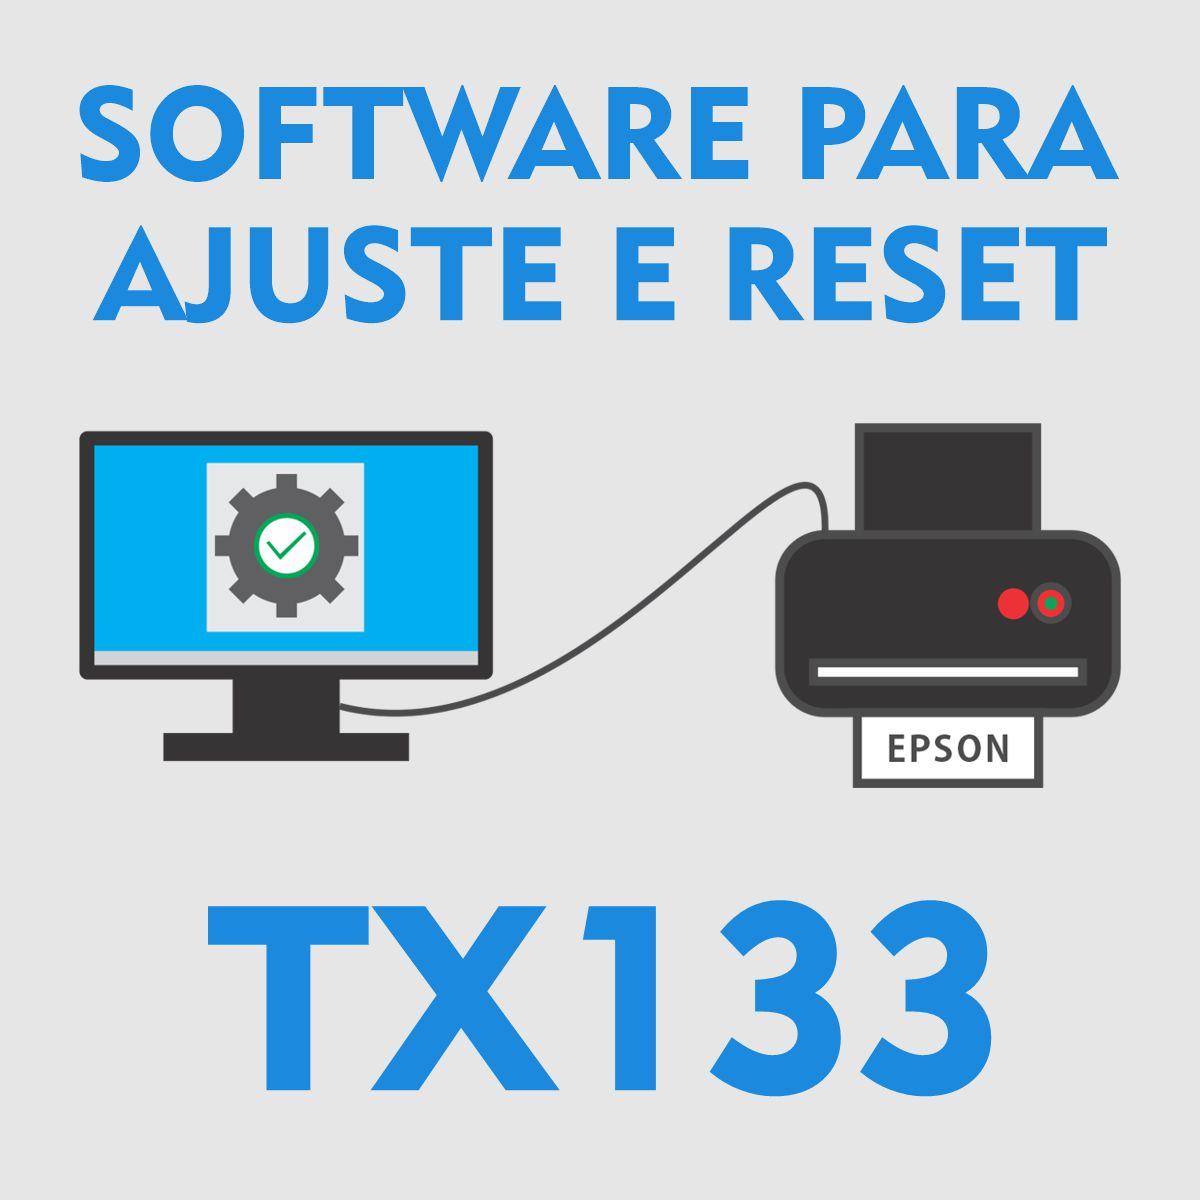 EPSON TX133   SOFTWARE PARA AJUSTES E RESET DAS ALMOFADAS